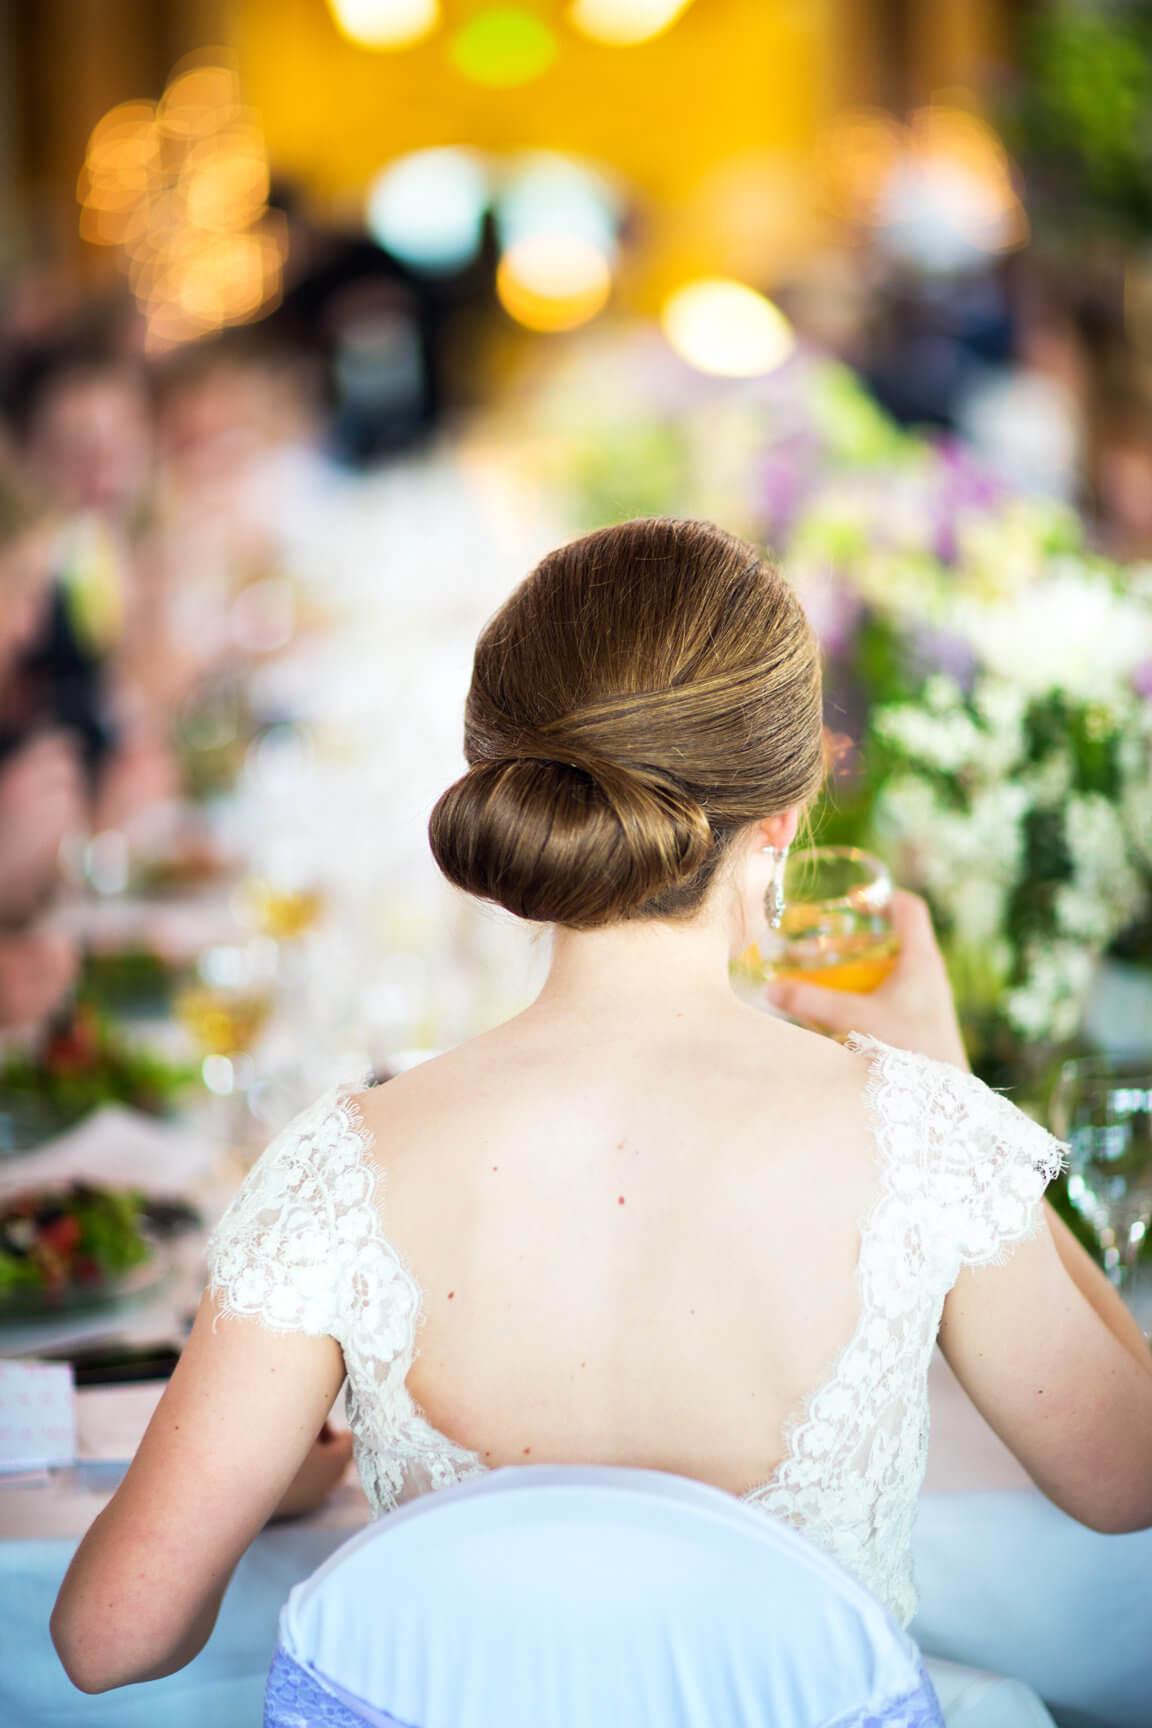 chignon with sleeves | Minnesota wedding photographer Studio KH wedding dress details | wedding blog | Sixpence Events 70 Ways to Photograph Your Wedding Dress.jpg